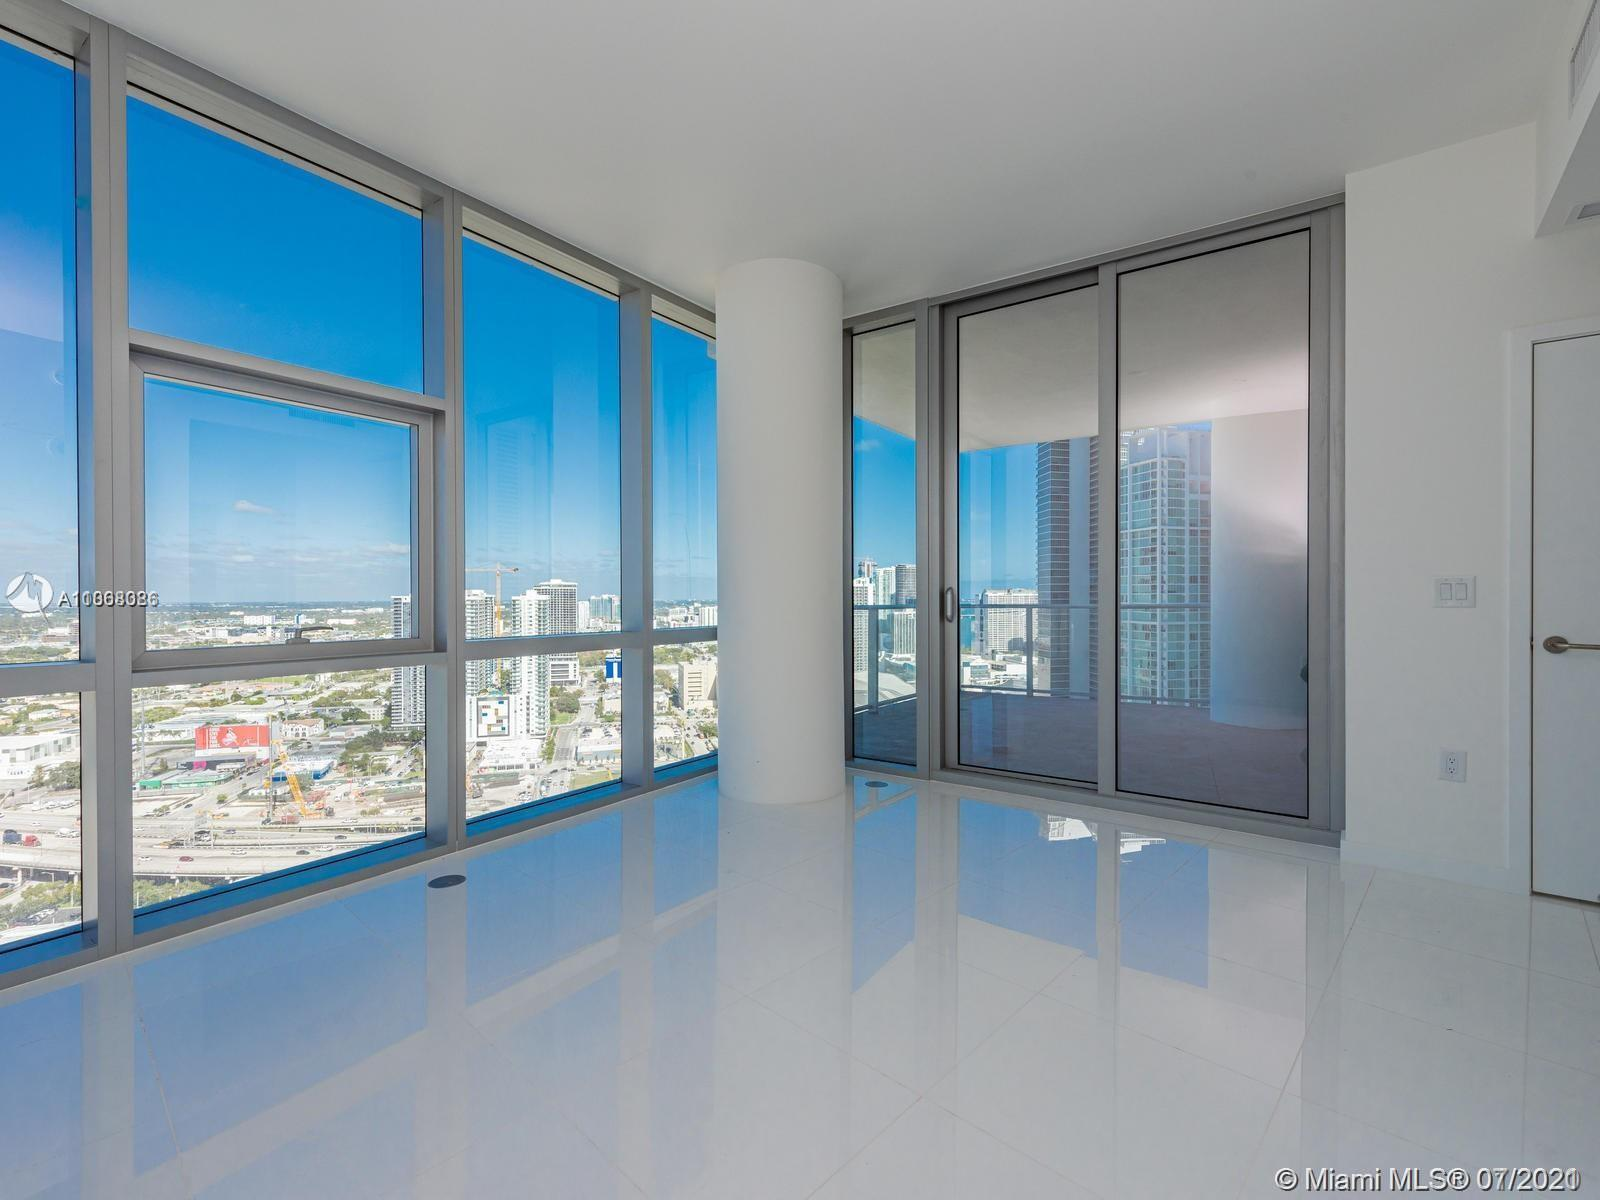 Paramount Miami Worldcenter #4200 - 05 - photo